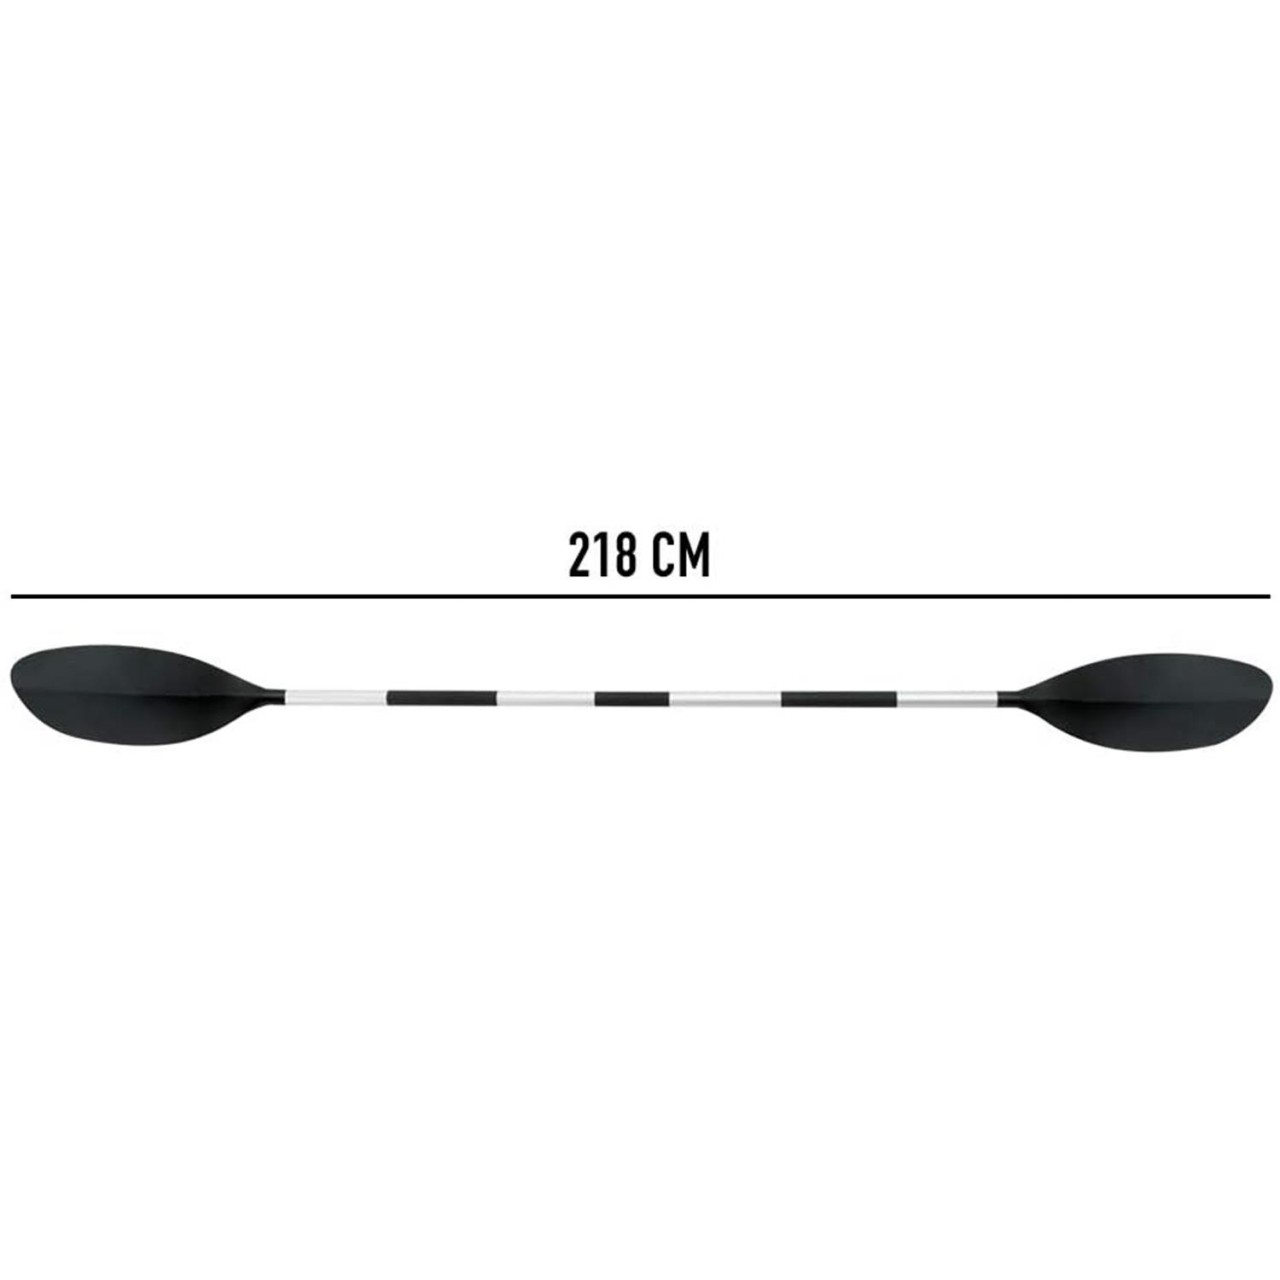 Intex 69629 Kajak Ruder Paddel Paddelset 218 cm Alu-Ausführung